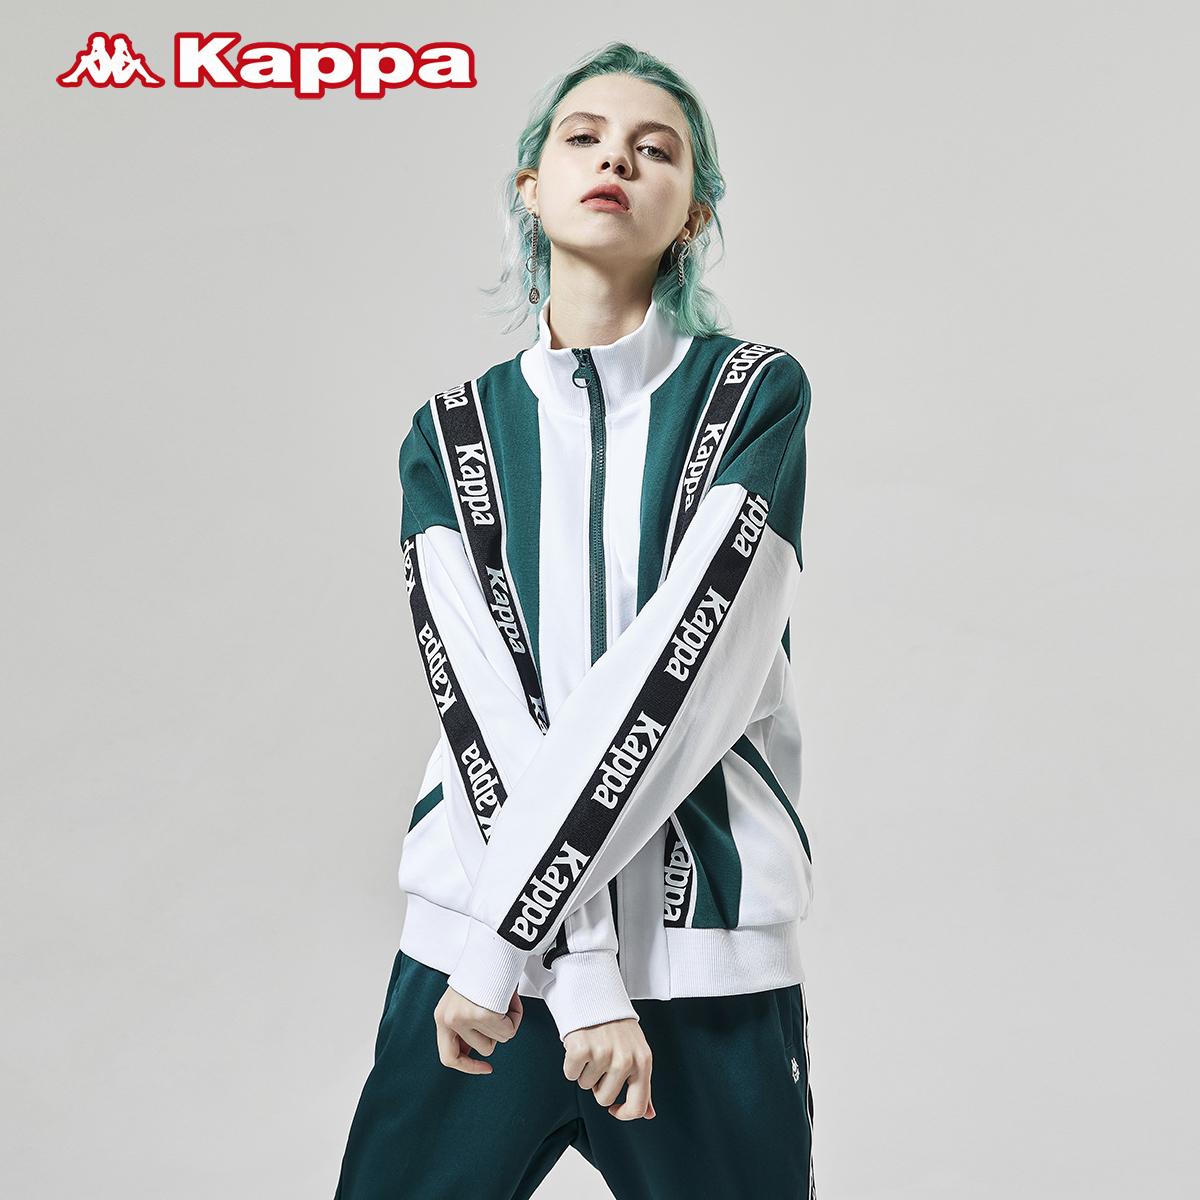 Kappa卡帕串标女款运动卫衣休闲开衫外套长袖拼接上衣 2020新款